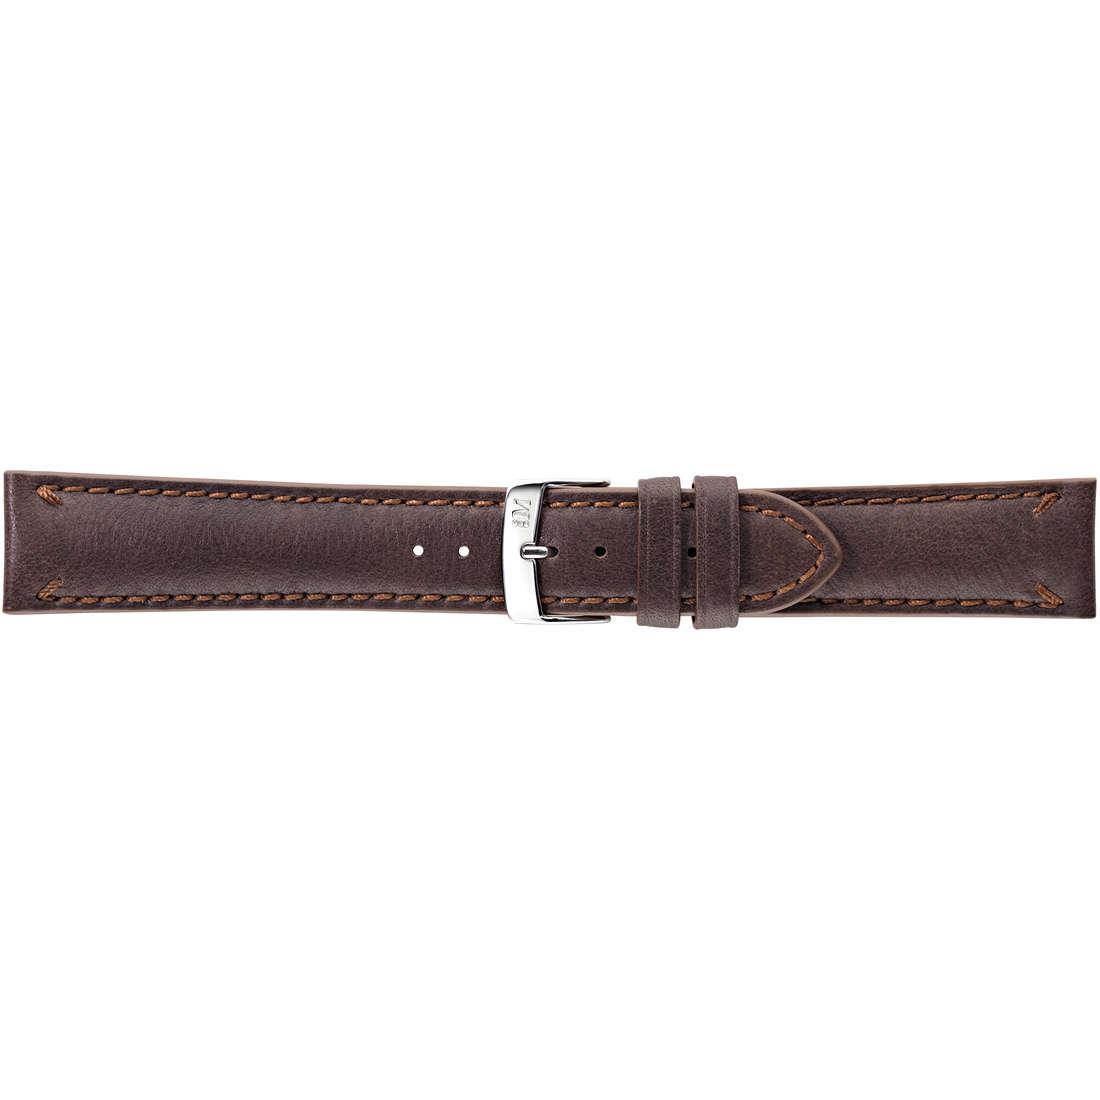 montre bande de montres homme Morellato Manufatti A01X4540A61030CR20